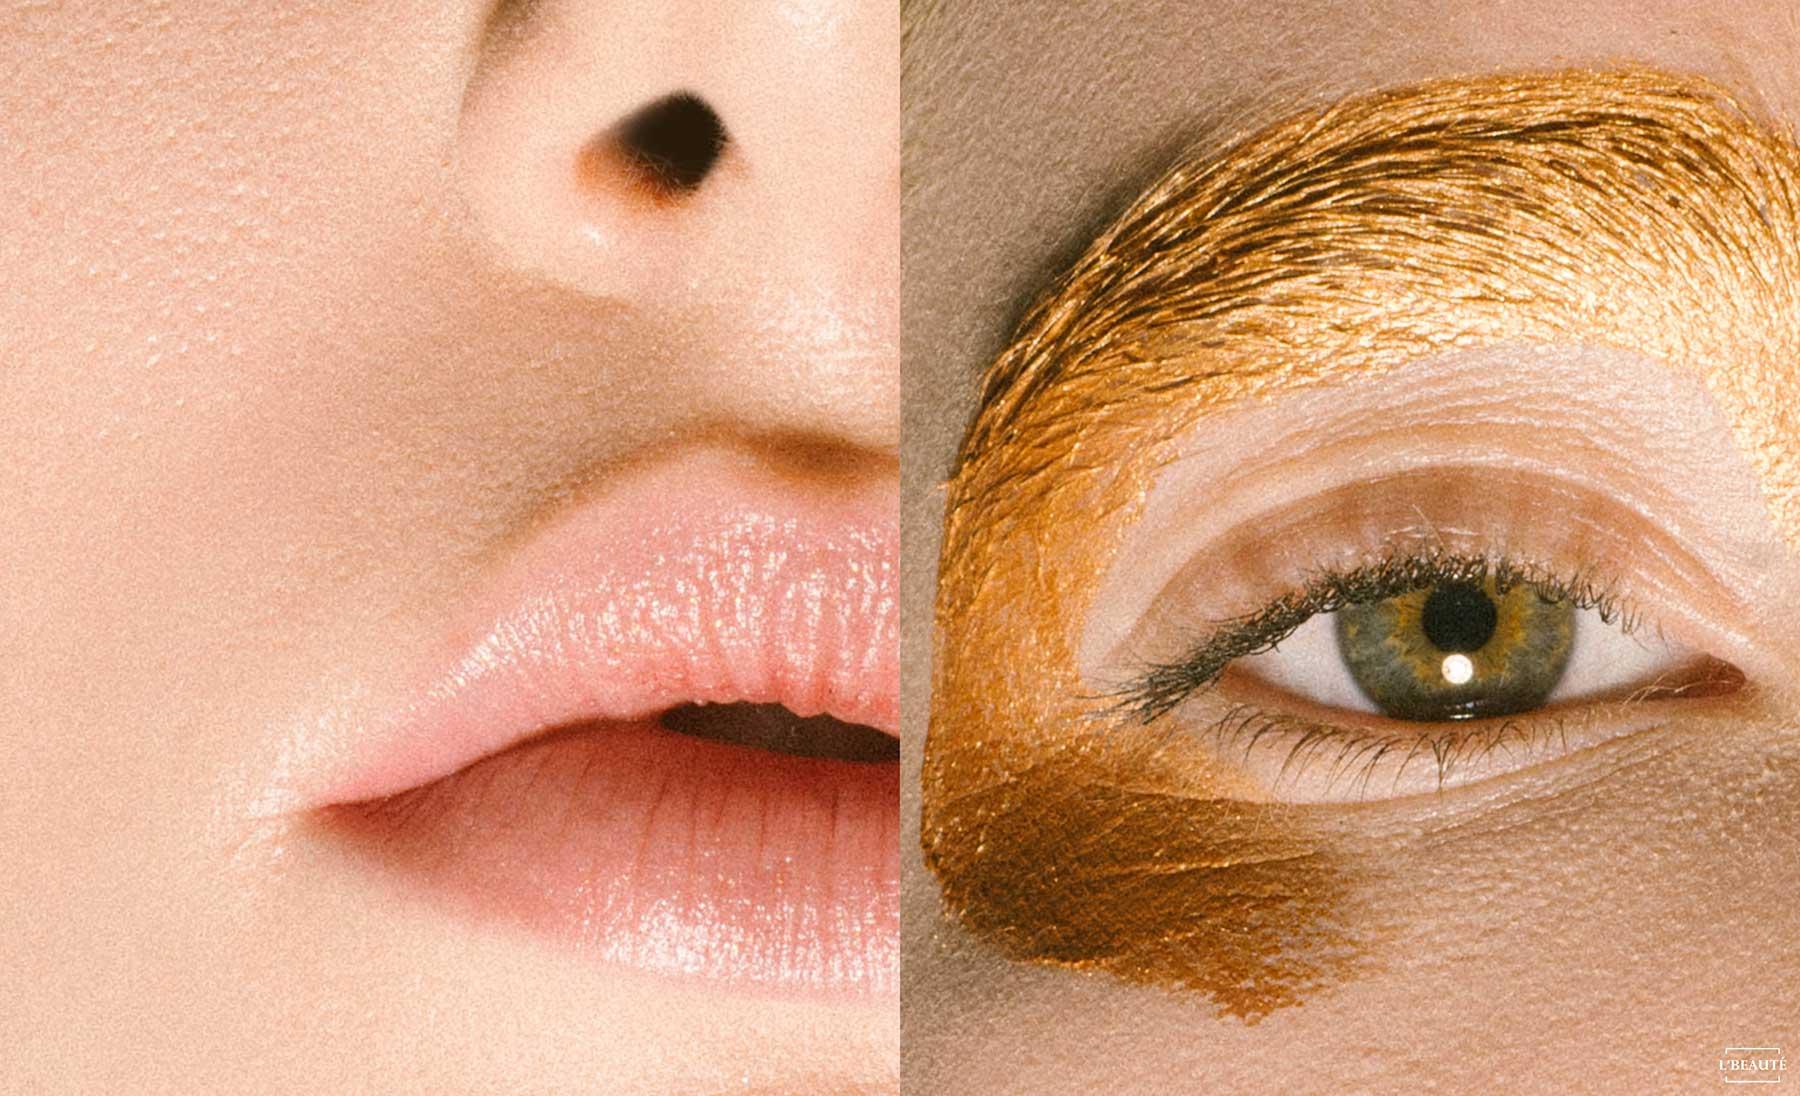 Beauty-Givenchy-Nicolas-Degennes14